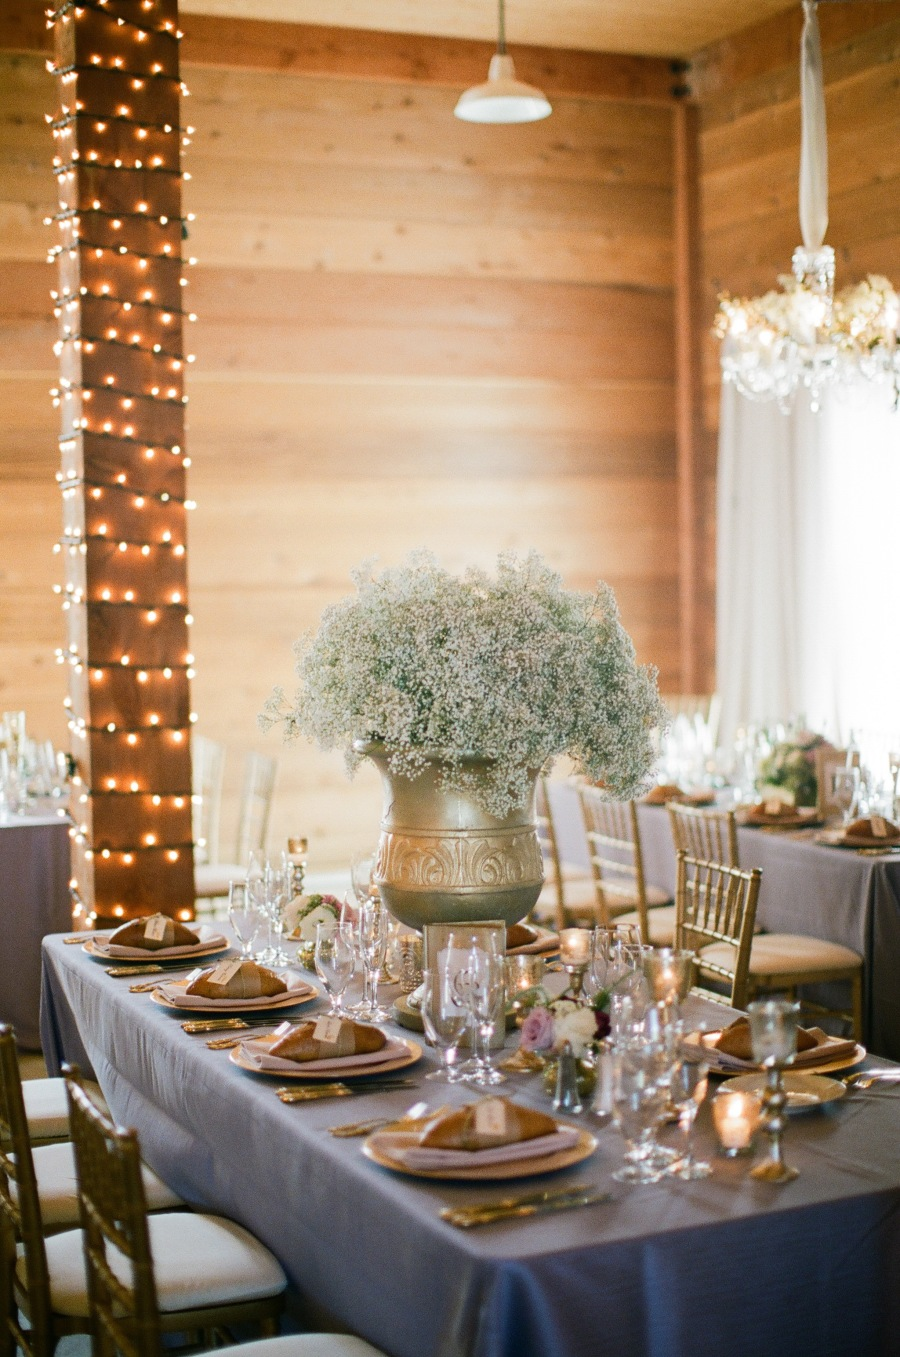 www.santabarbarawedding.com | Soigne Productions | Michael and Anna Costa | Zaca Creek Ranch | Reception Table